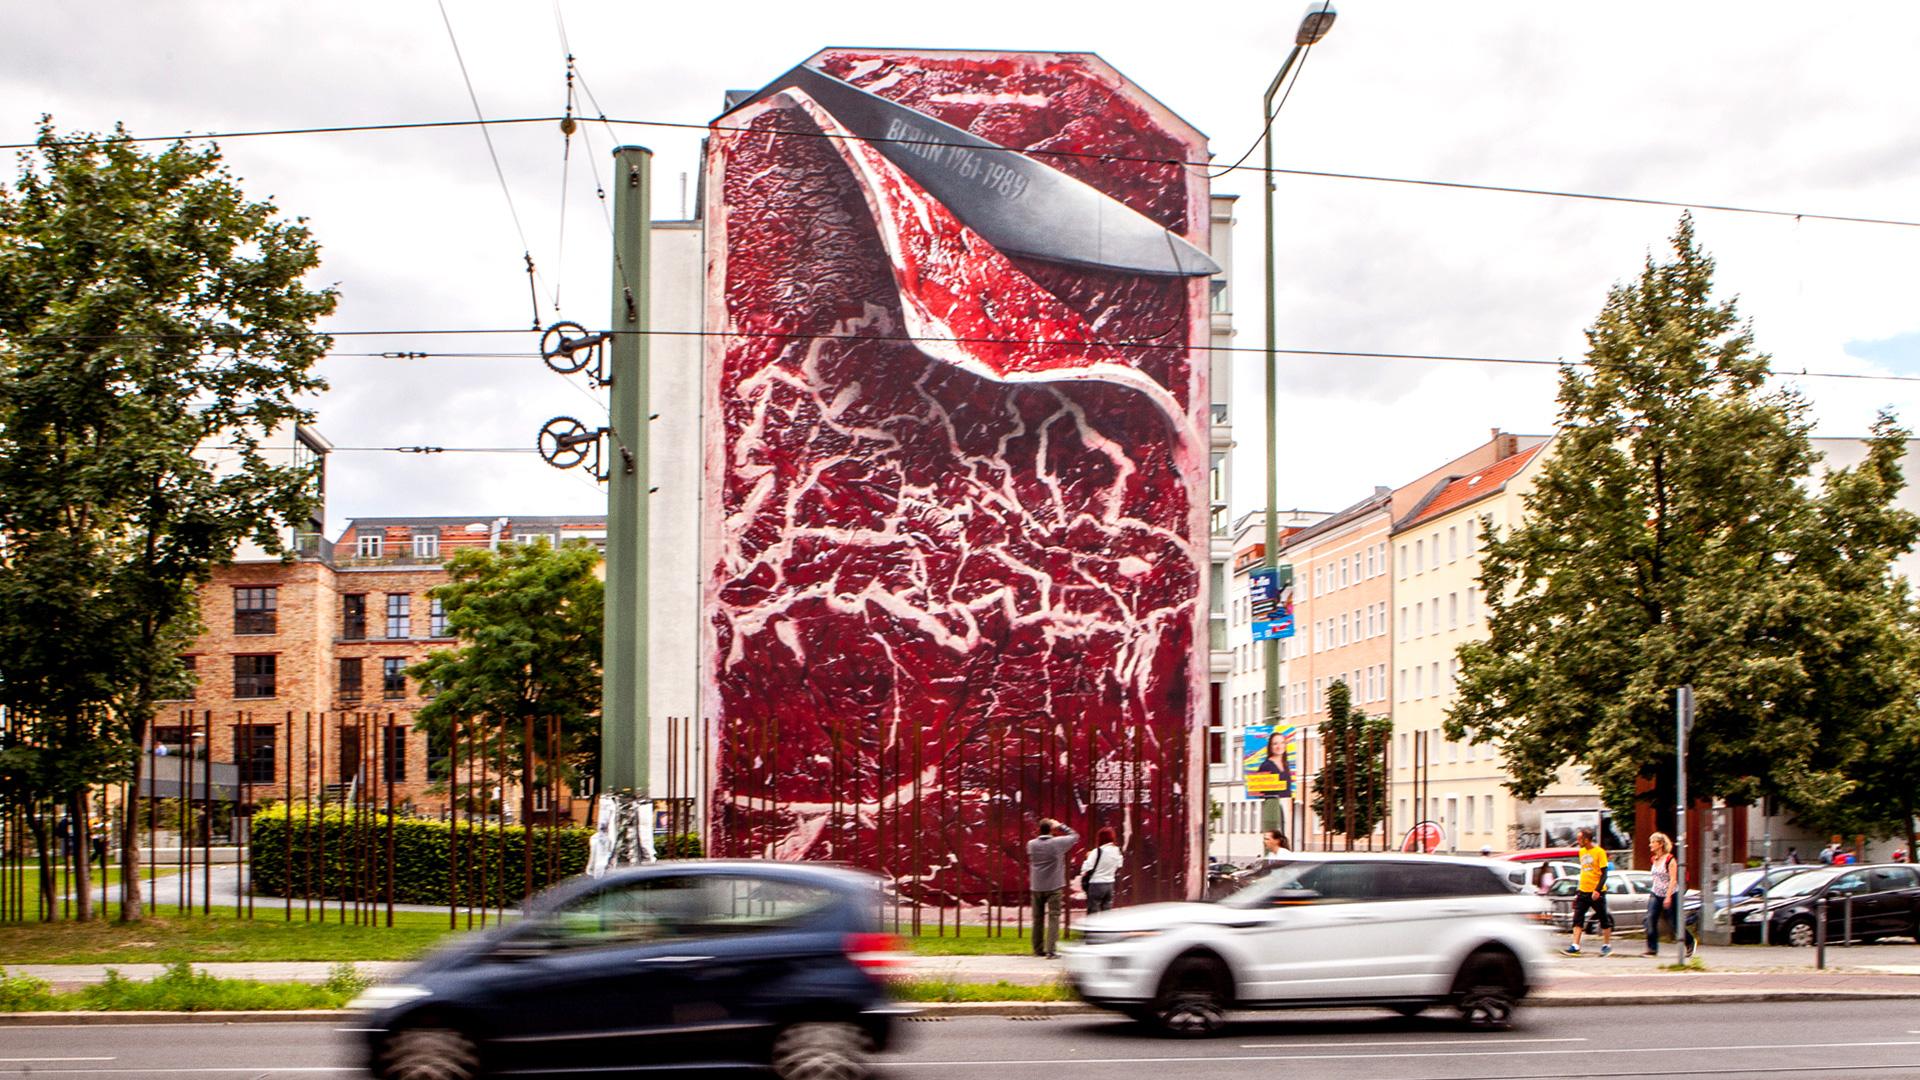 If Walls Could Talk – Mural Berlin